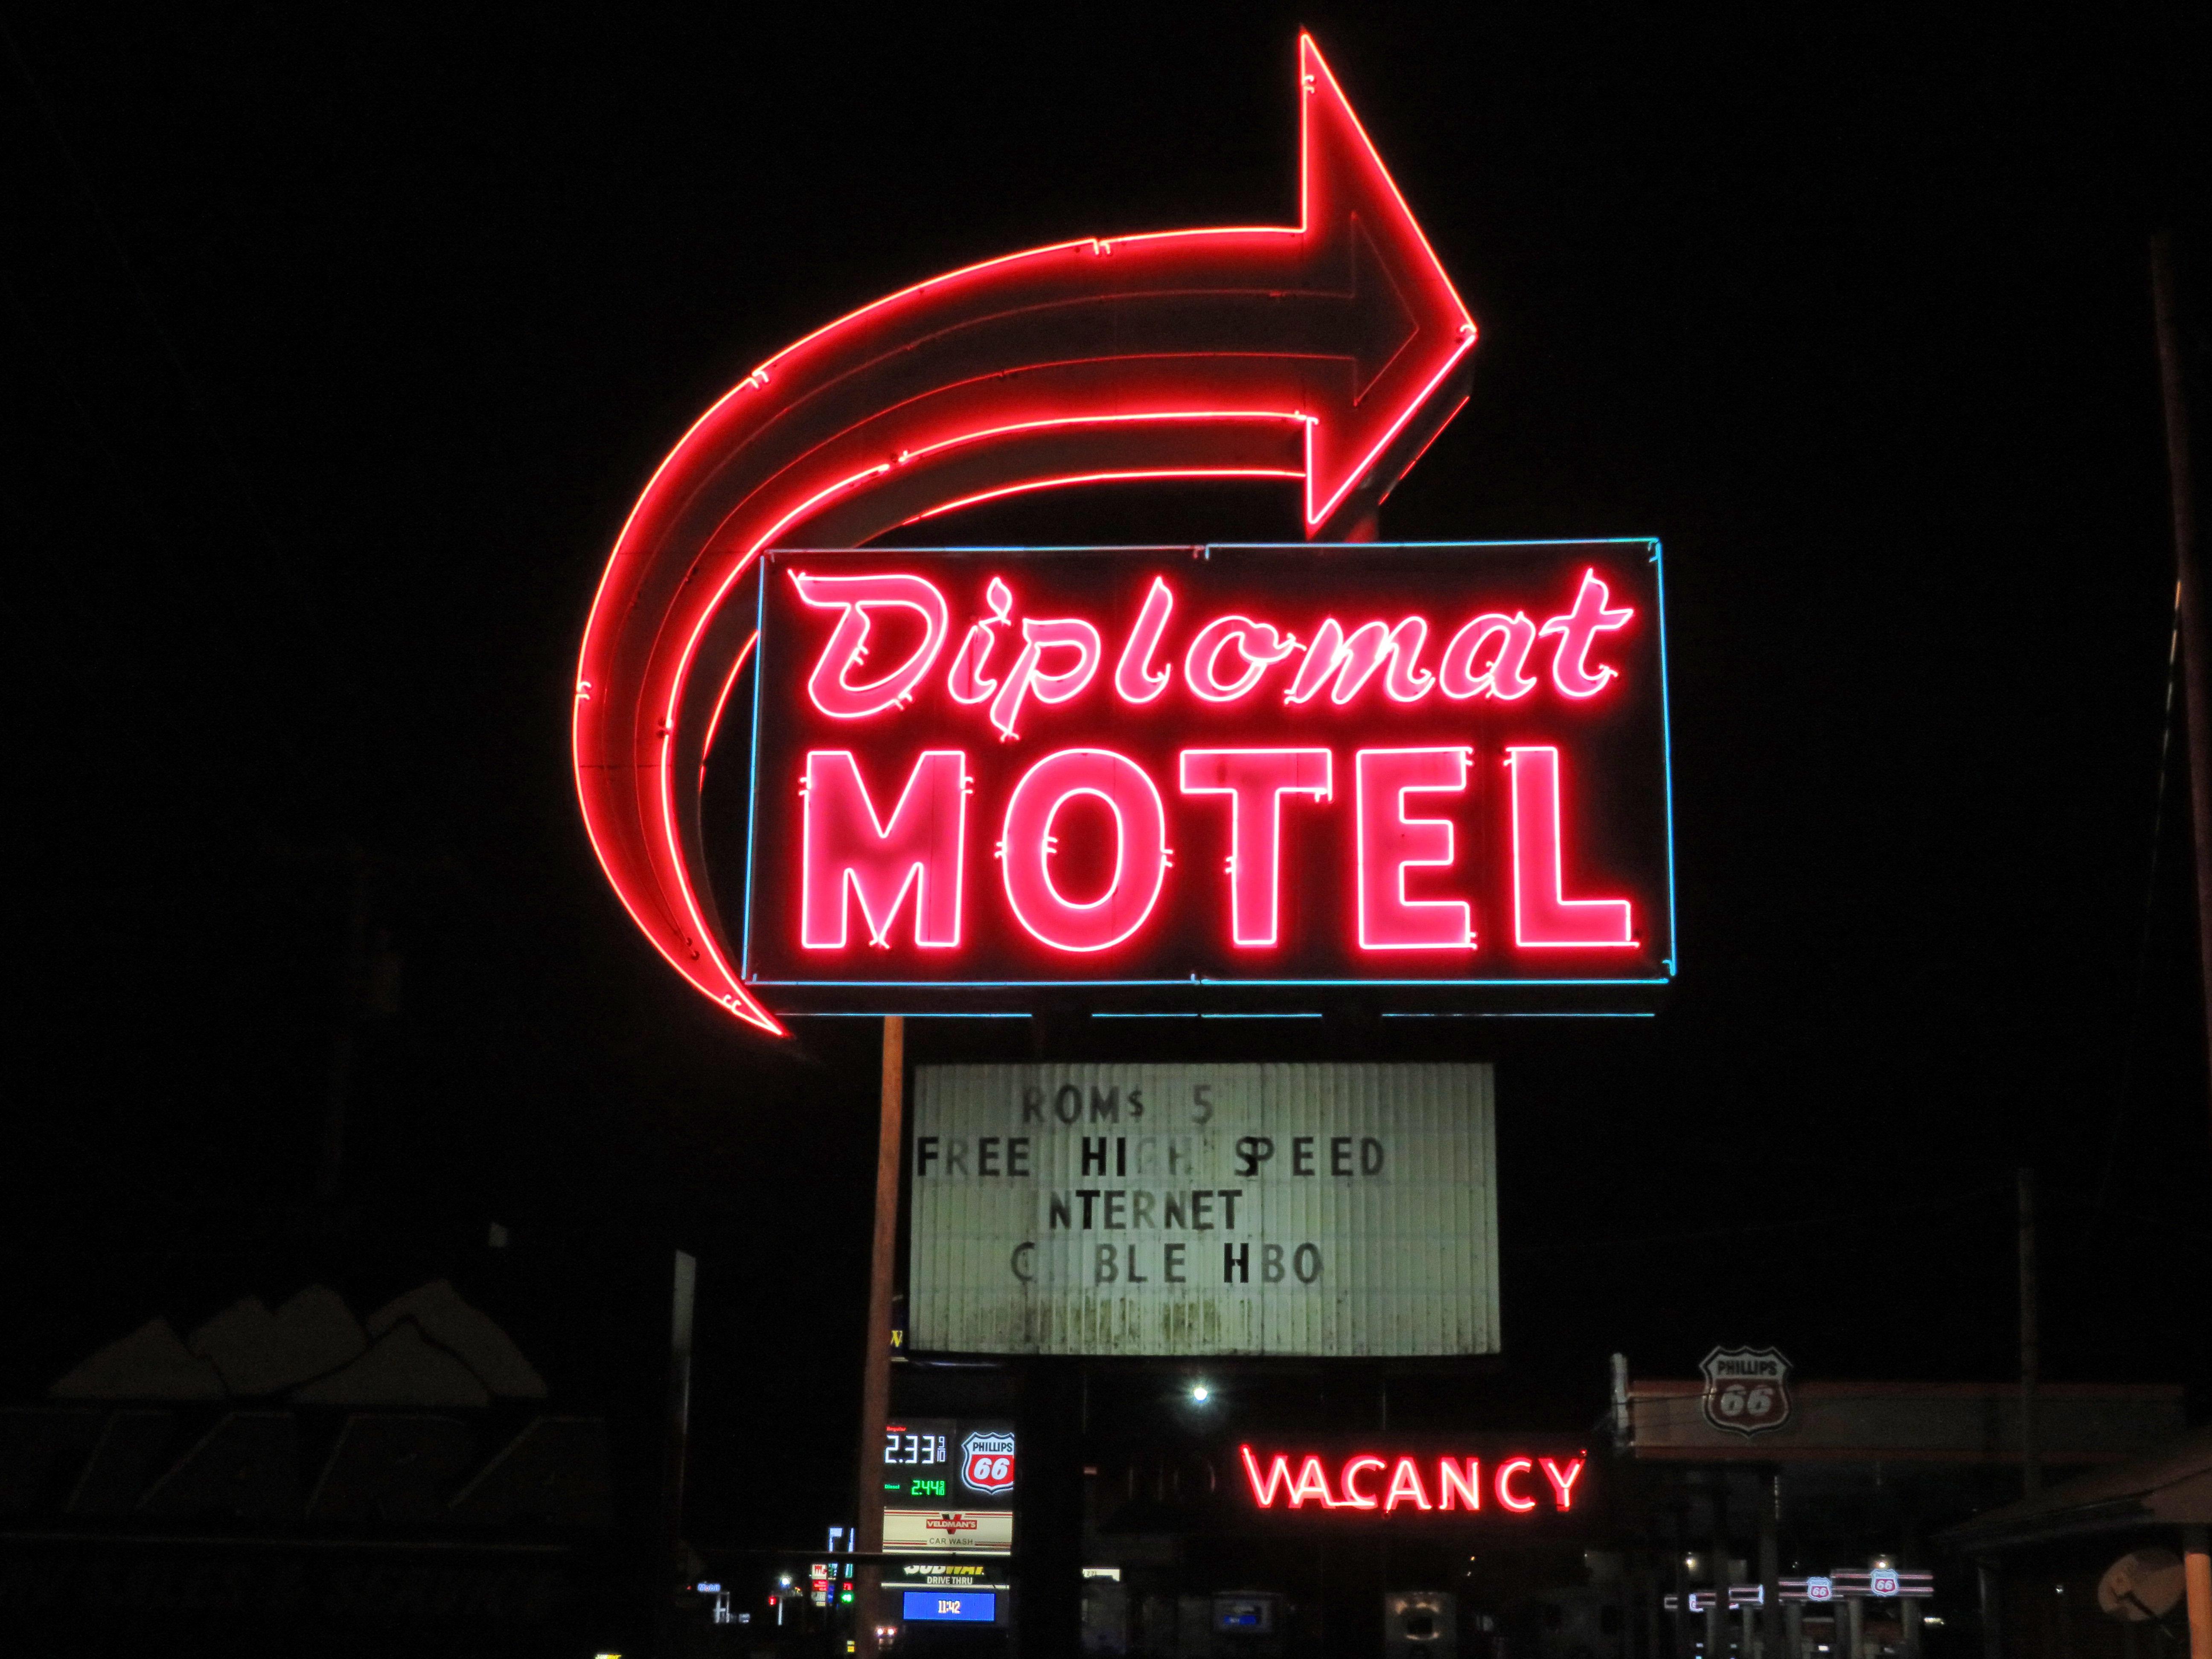 Diplomat Motel - 3300 Cassopolis Street, Elkhart, Indiana U.S.A. - March 4, 2017